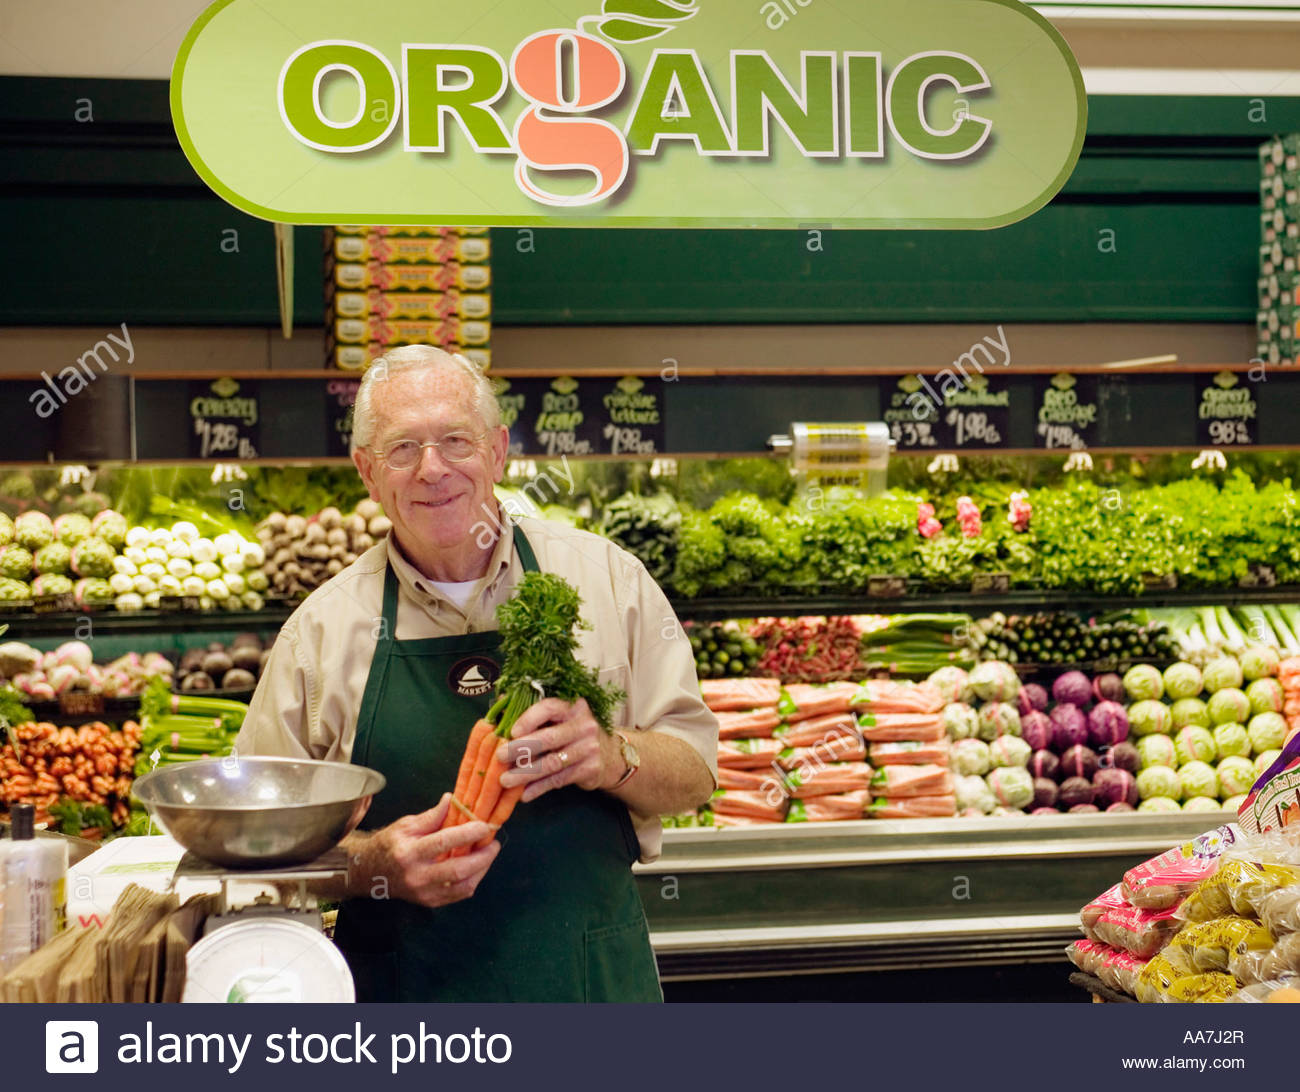 mature grocery clerk working in organic produce aisle of grocery mature grocery clerk working in organic produce aisle of grocery store